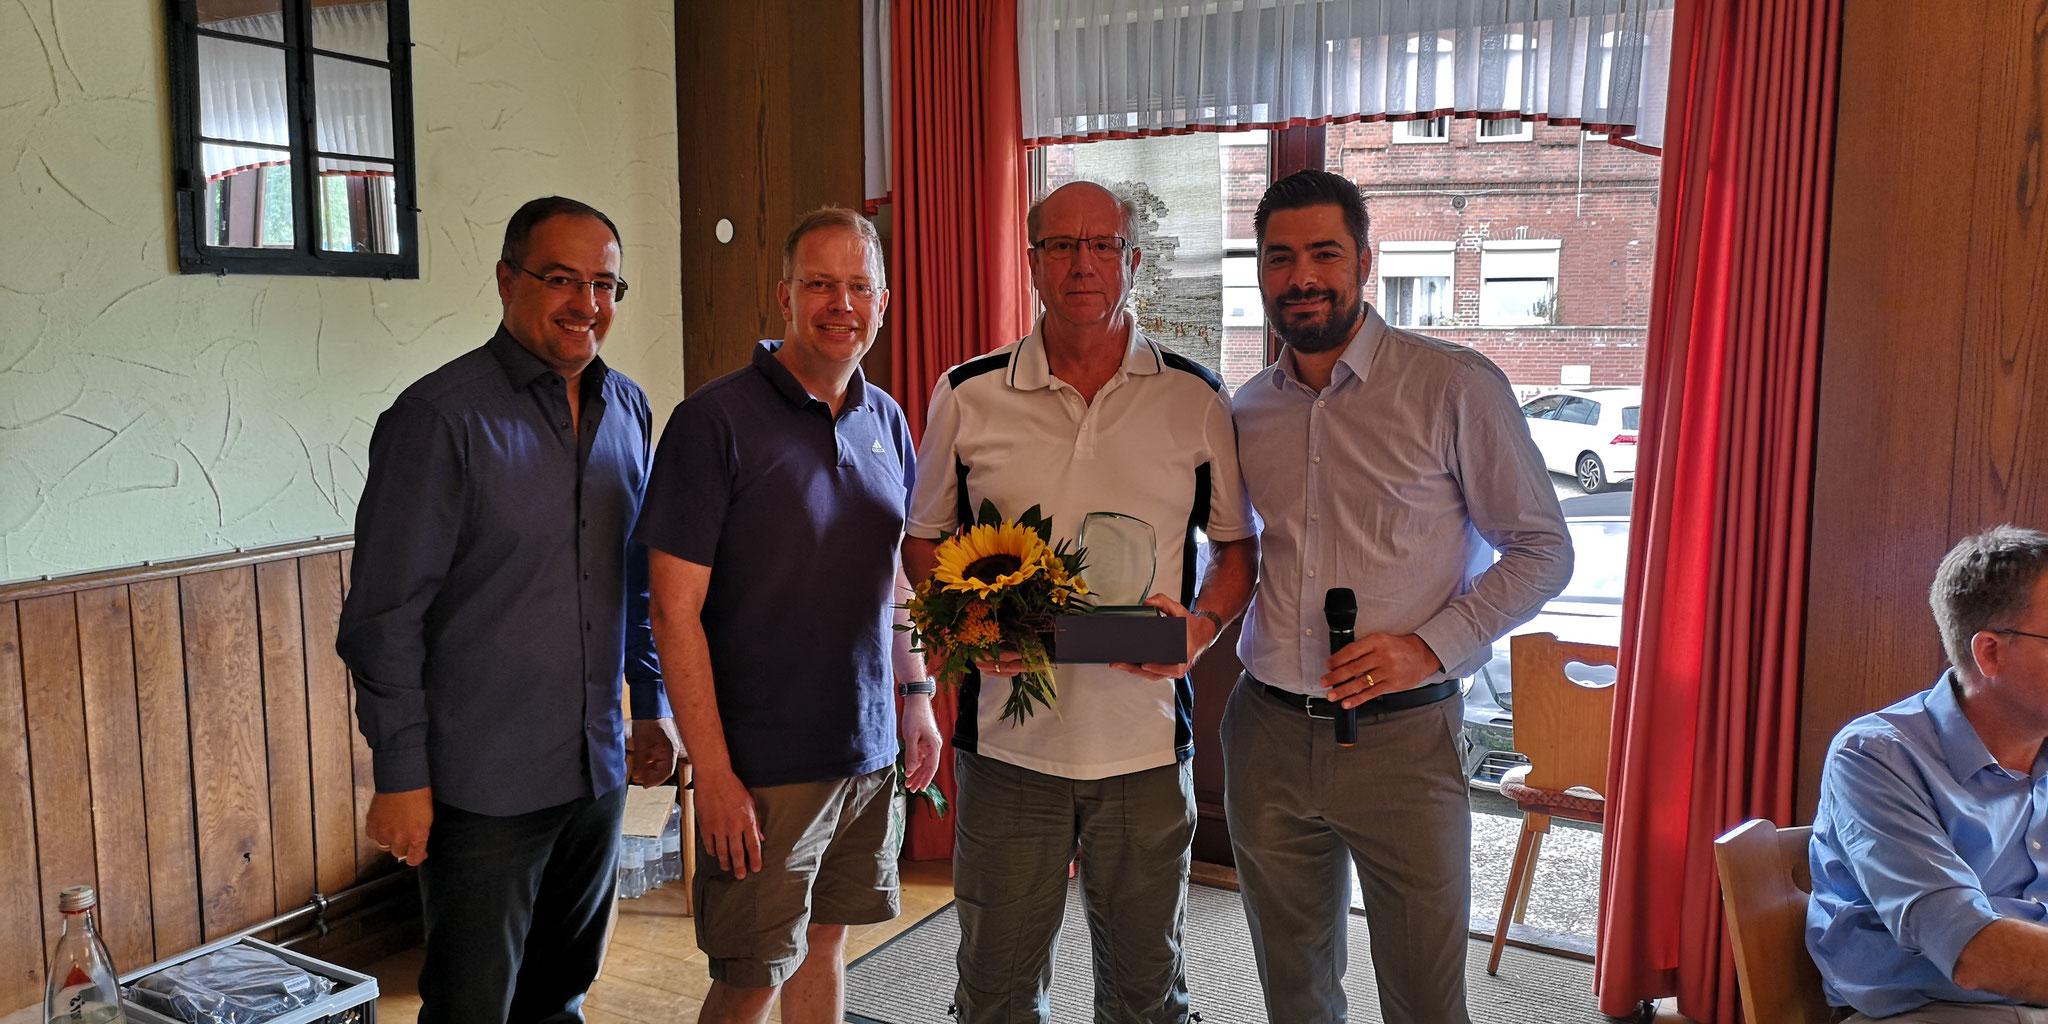 20 Jahre Schiedsrichterbetreuer: Rudi Leu